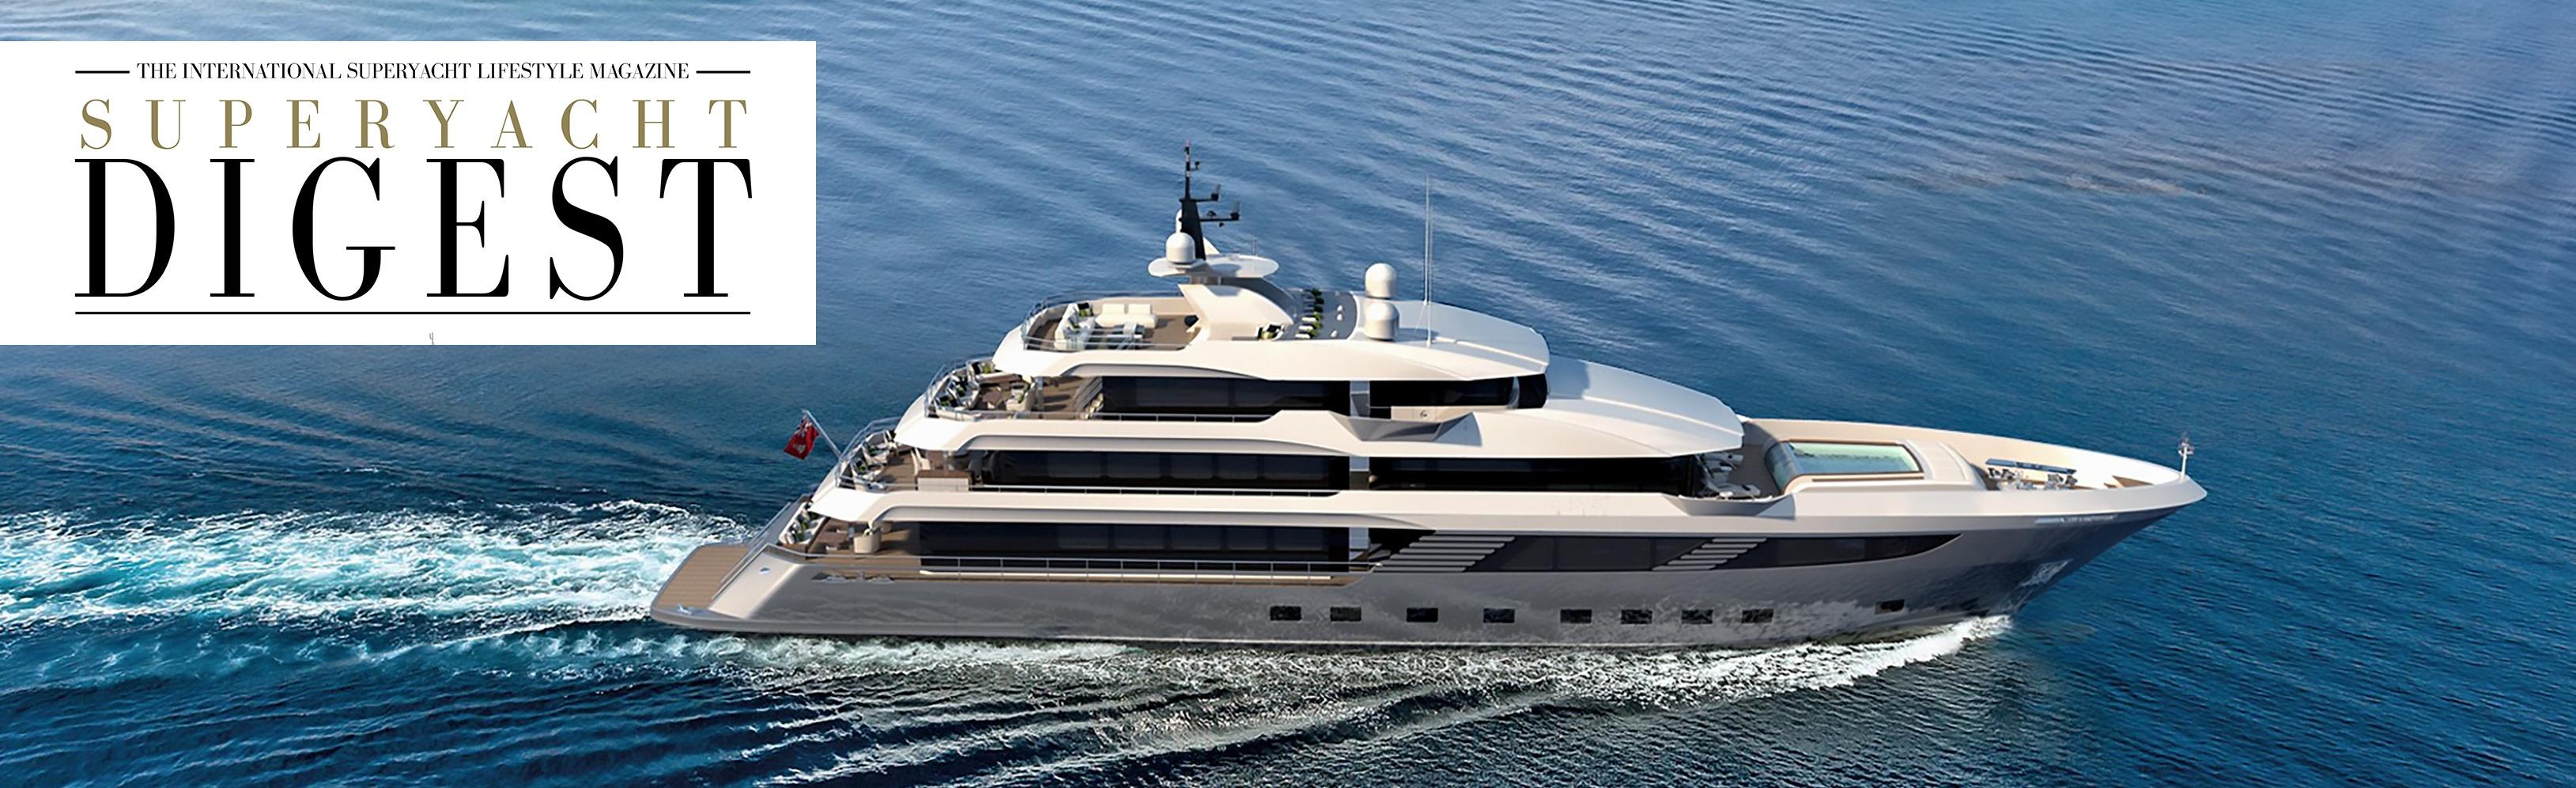 Superyacht-Digest,-Majesty-175.jpg